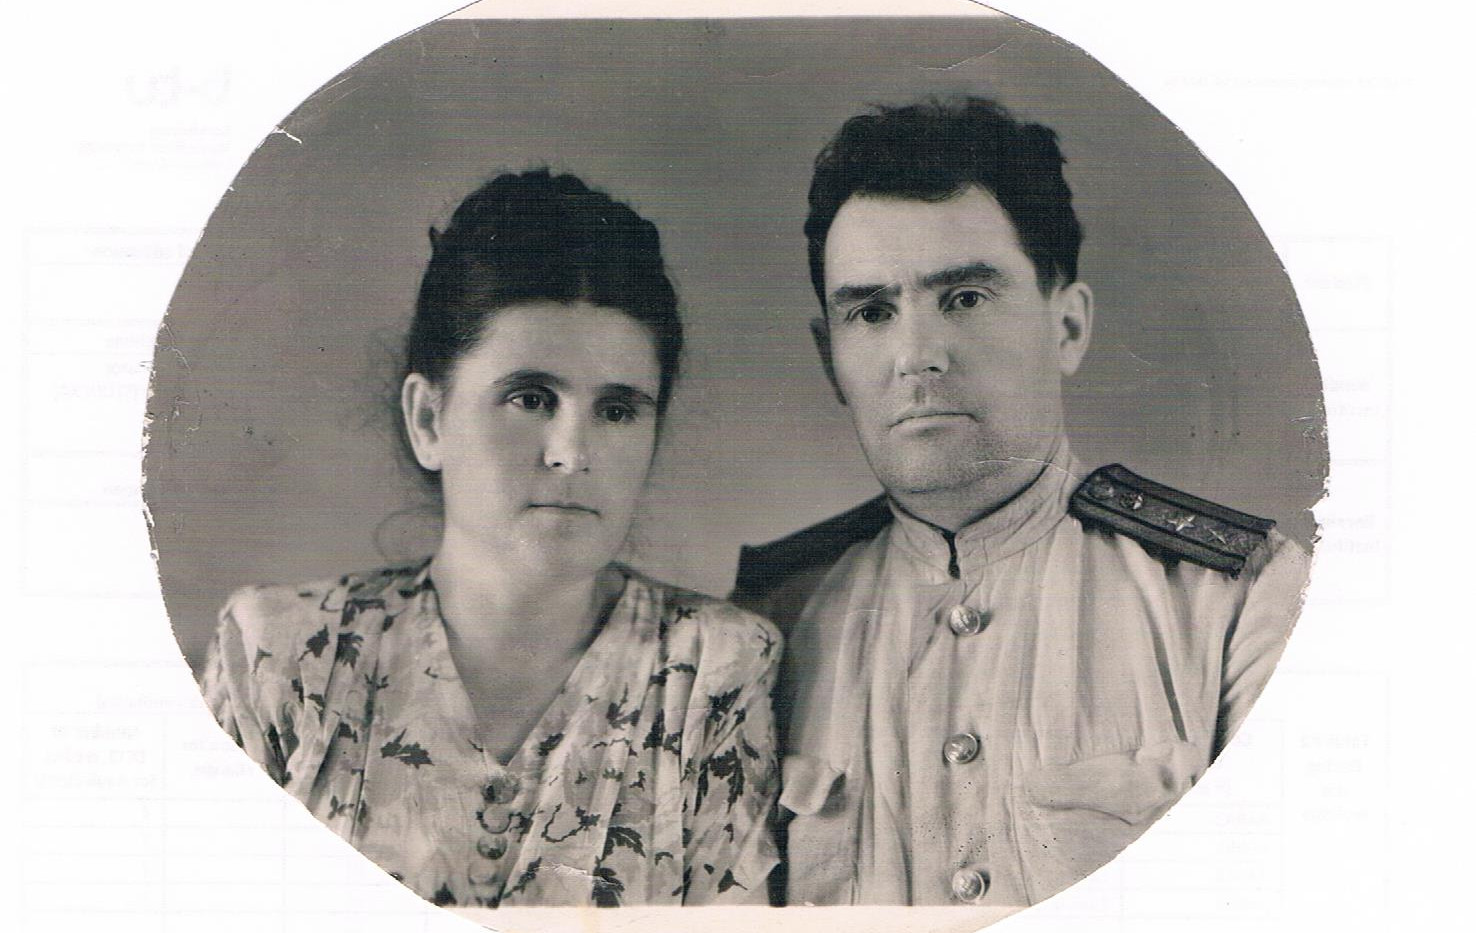 Schorochovy